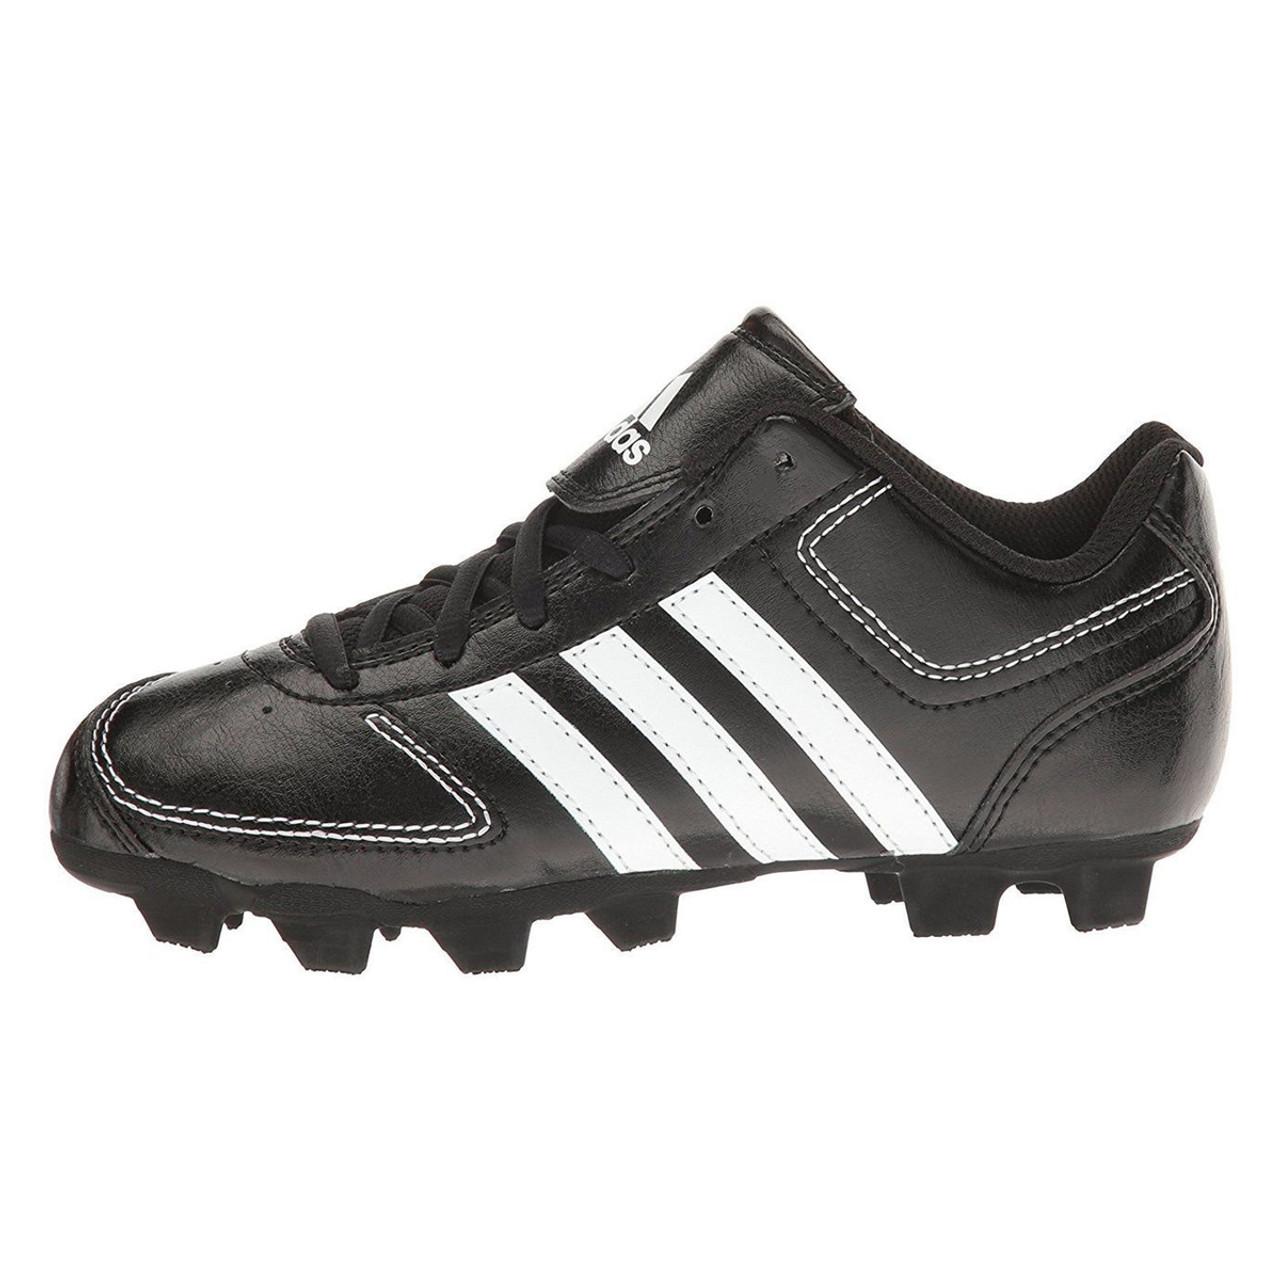 Adidas Tater TPU 4k Youth Junior Baseball Cleats G66359 - Black and ... f4c030e23bb